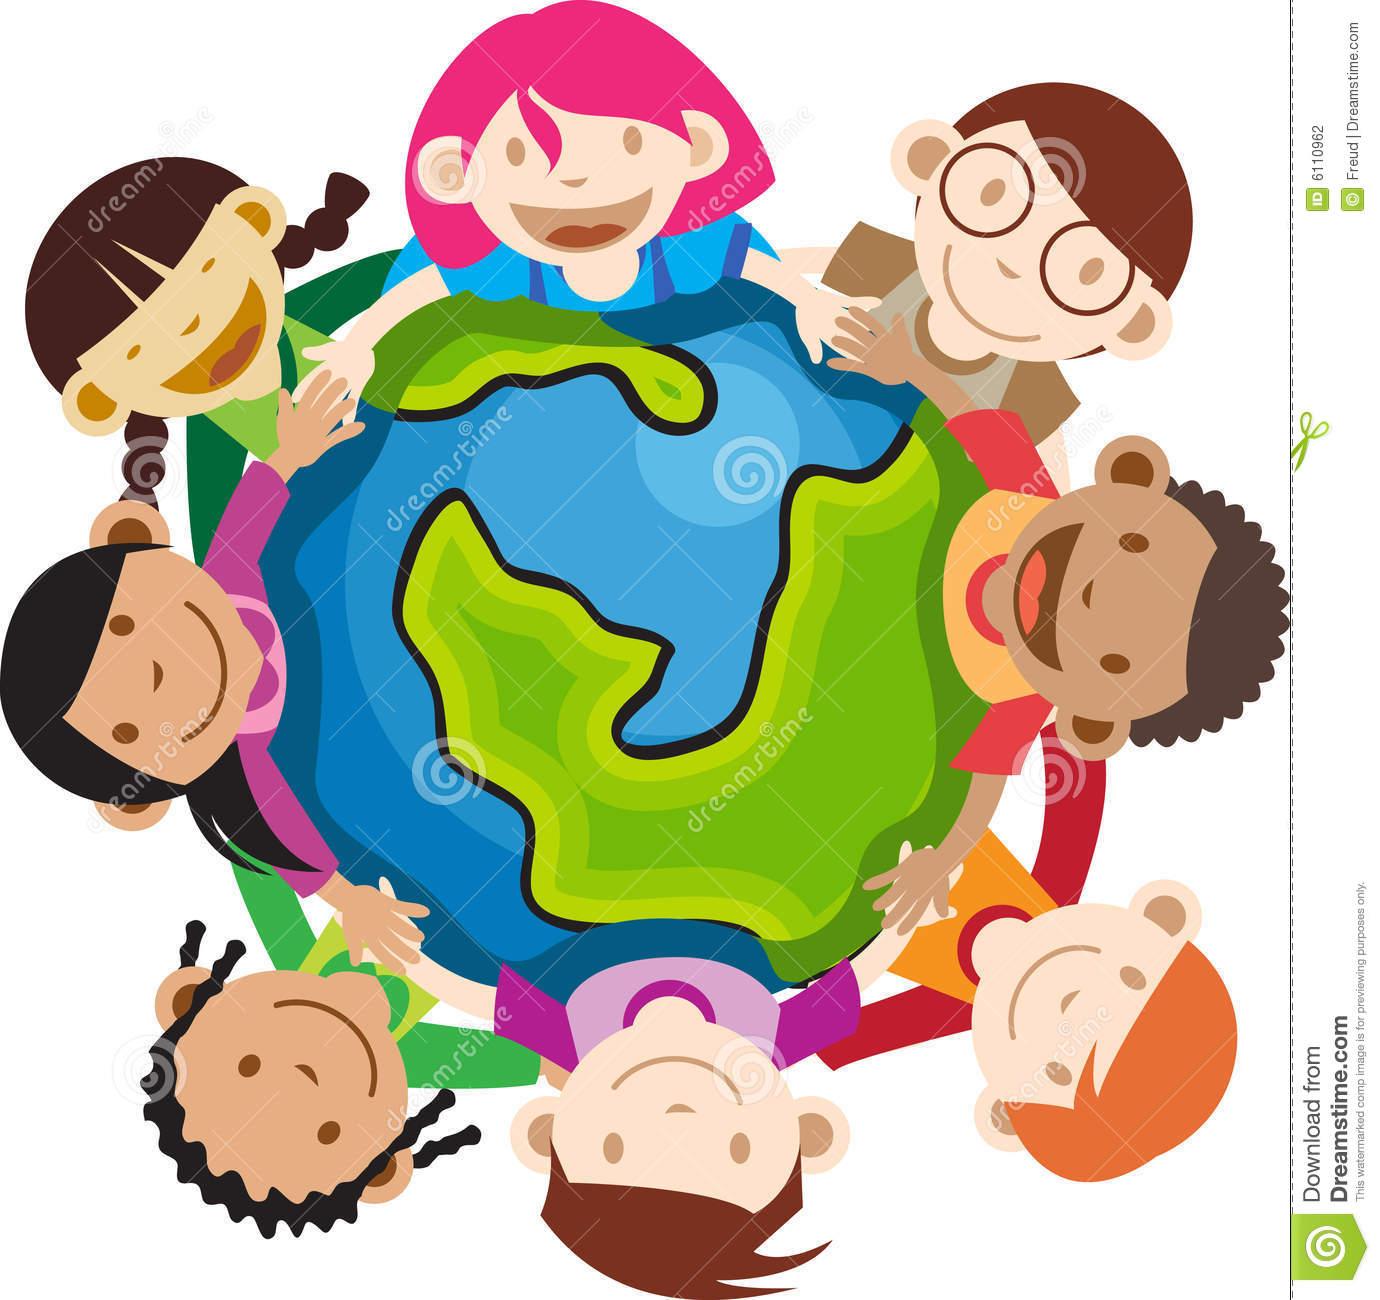 April ethnic kids clipart clip download Kids Celebrating Clipart | Free download best Kids Celebrating ... clip download